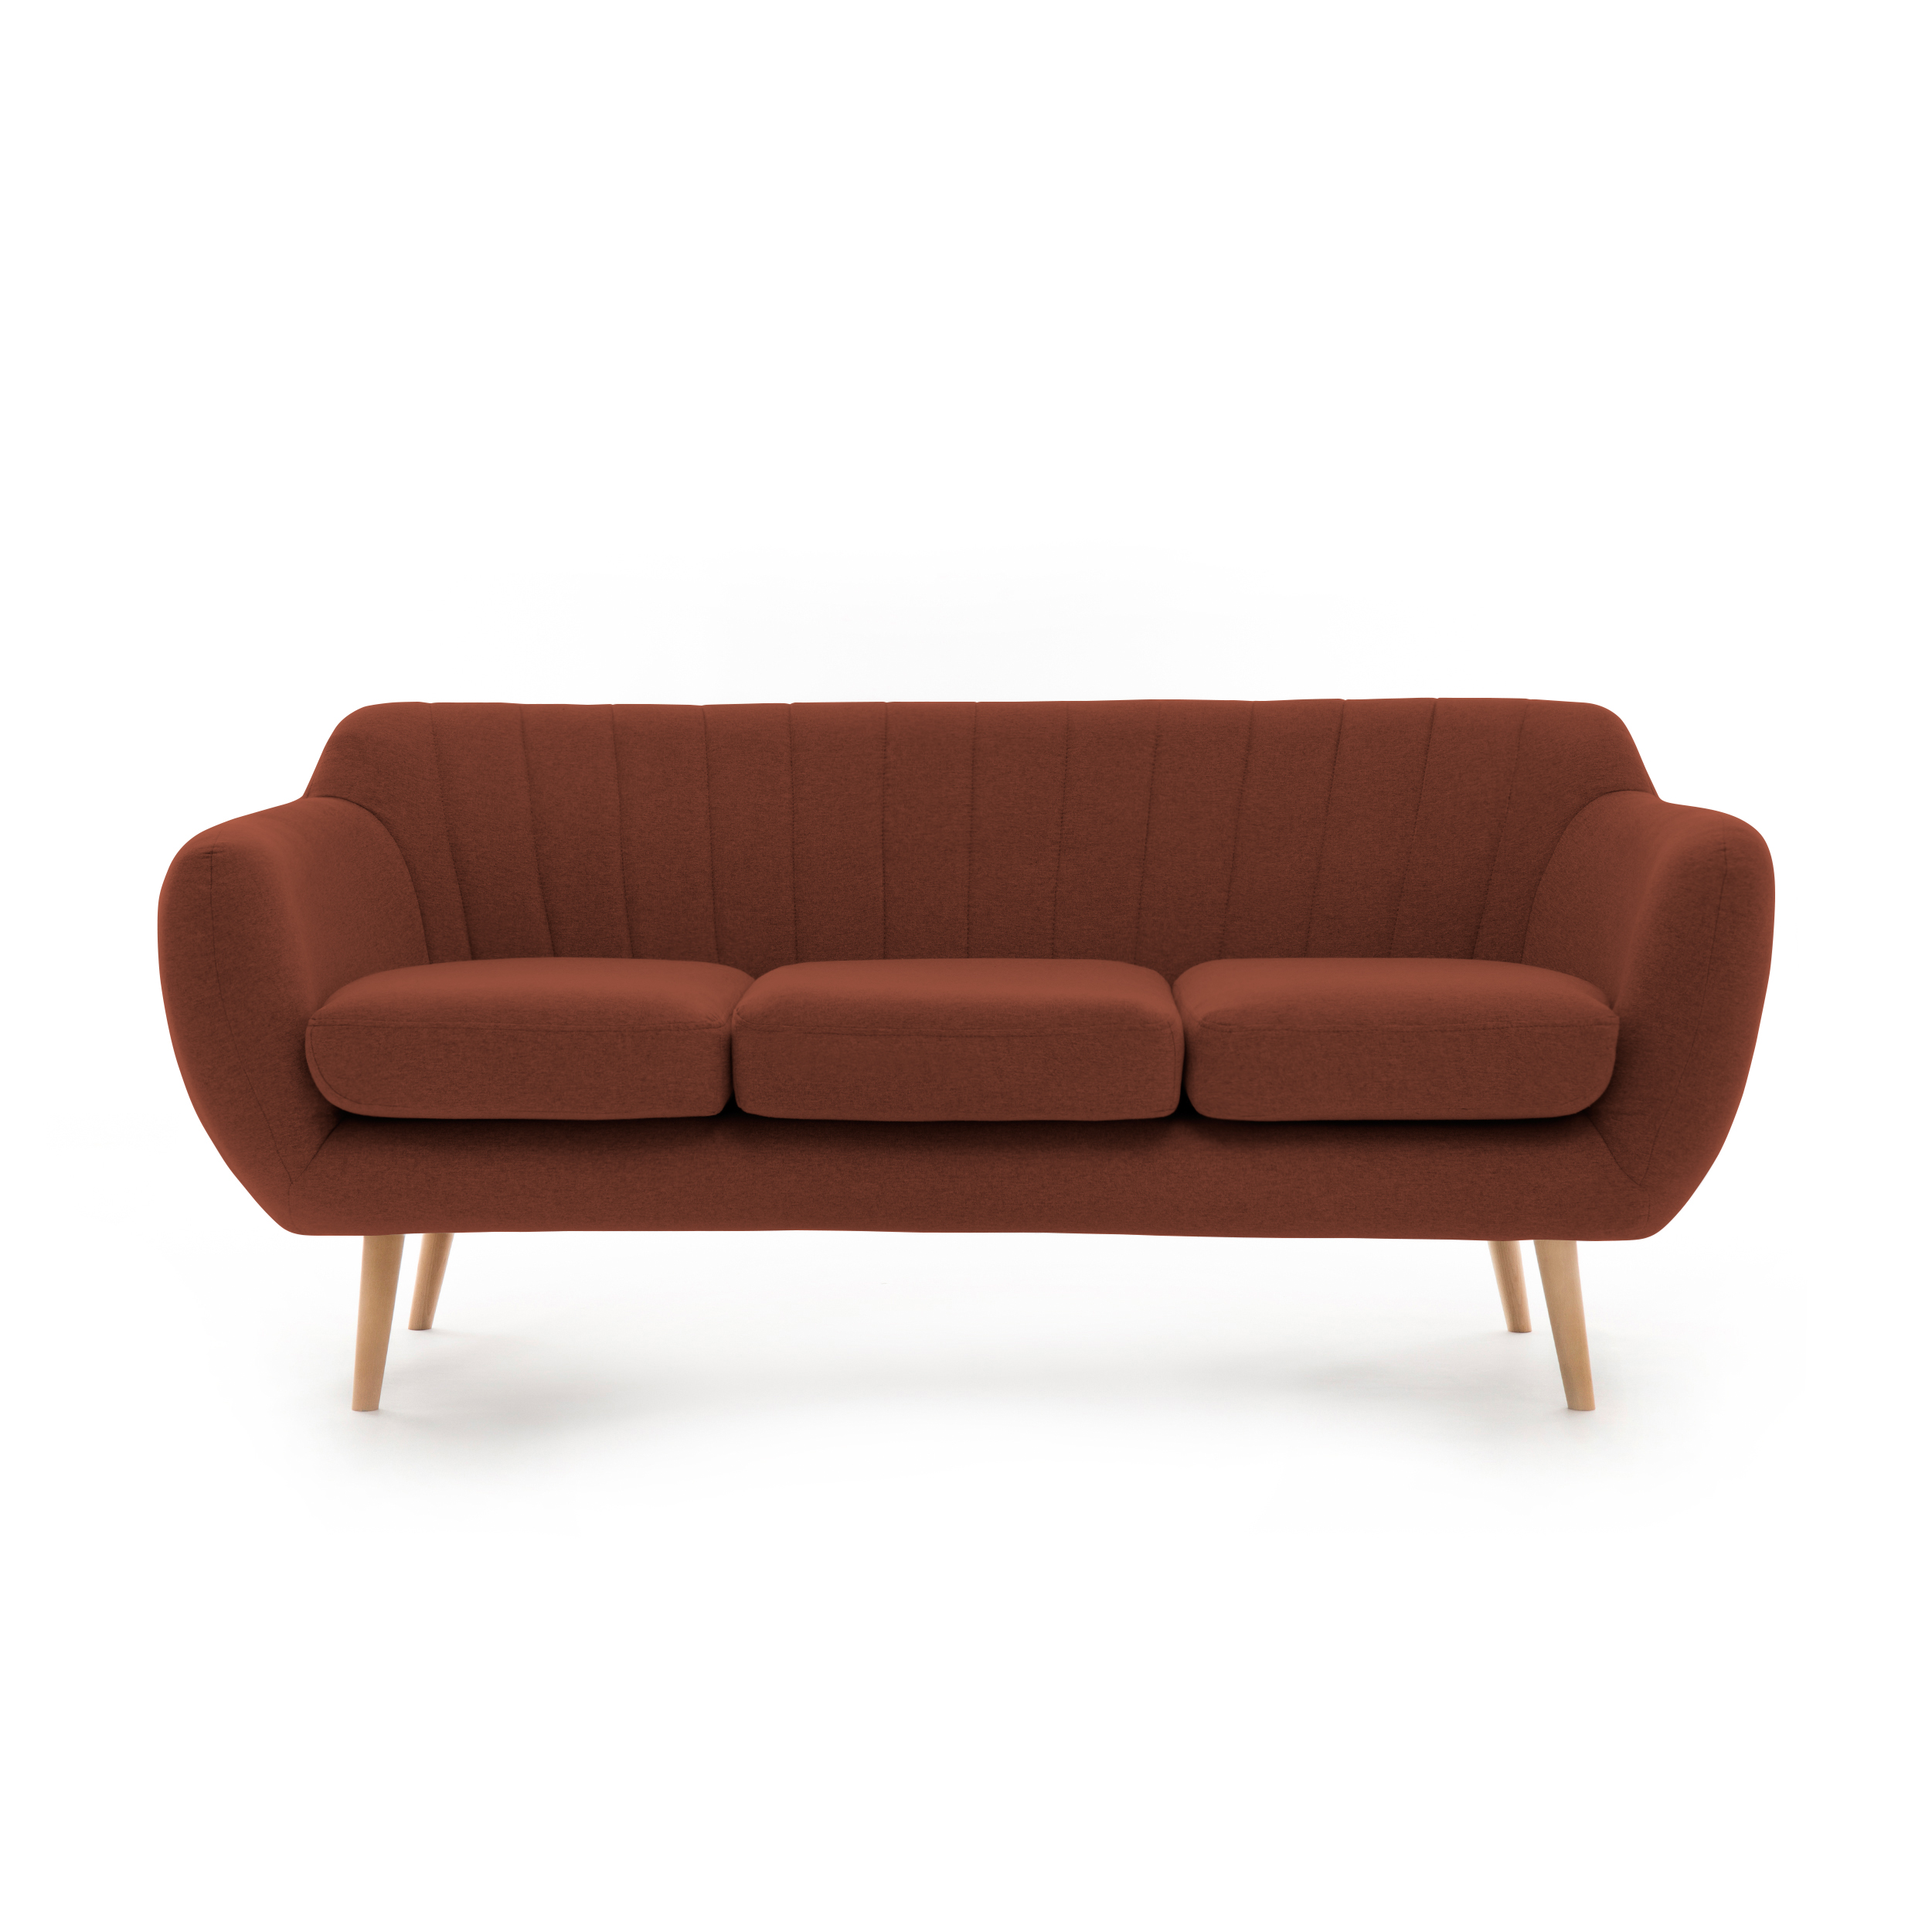 Canapea Fixa 3 locuri Kennet Marsala